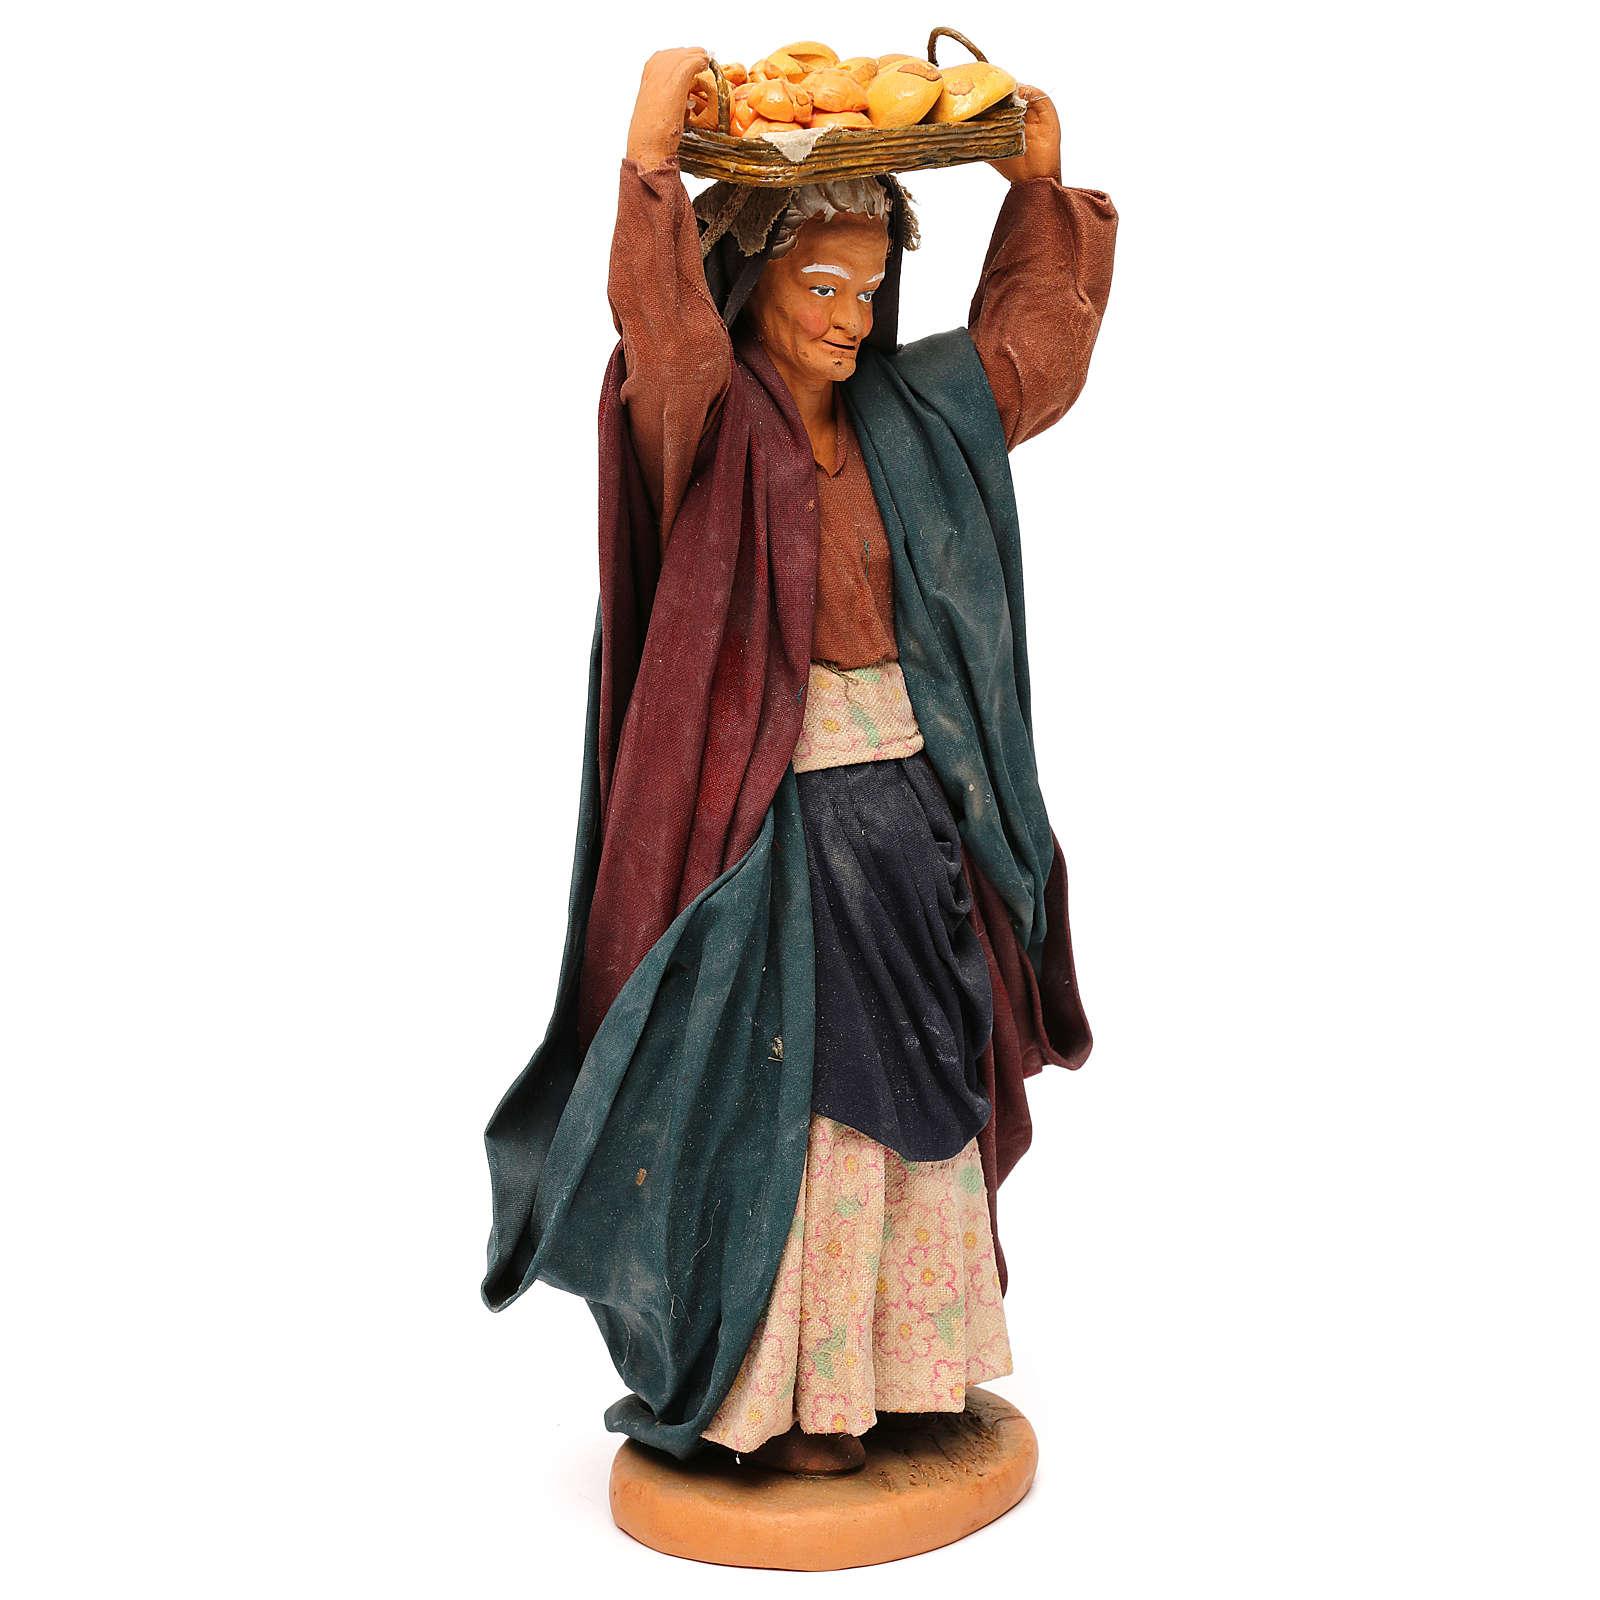 STOCK Mujer con cesta vestida terracota de 30 cm belén napolitano 4